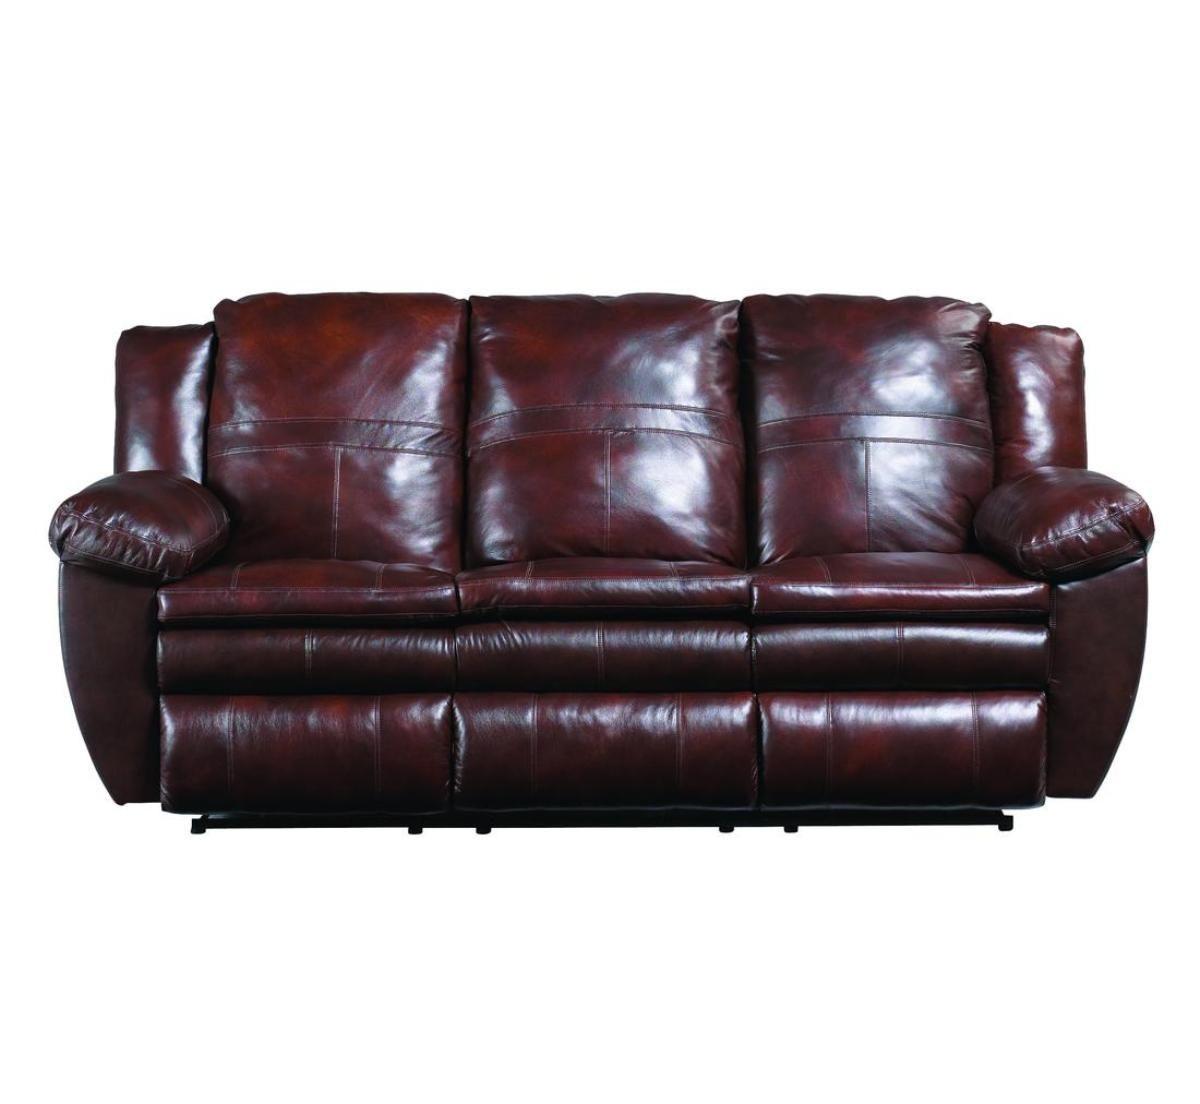 Durango Reclining Sofa Badcock More I Want A New Couch  ~ Leggett And Platt Leather Recliner Sofa